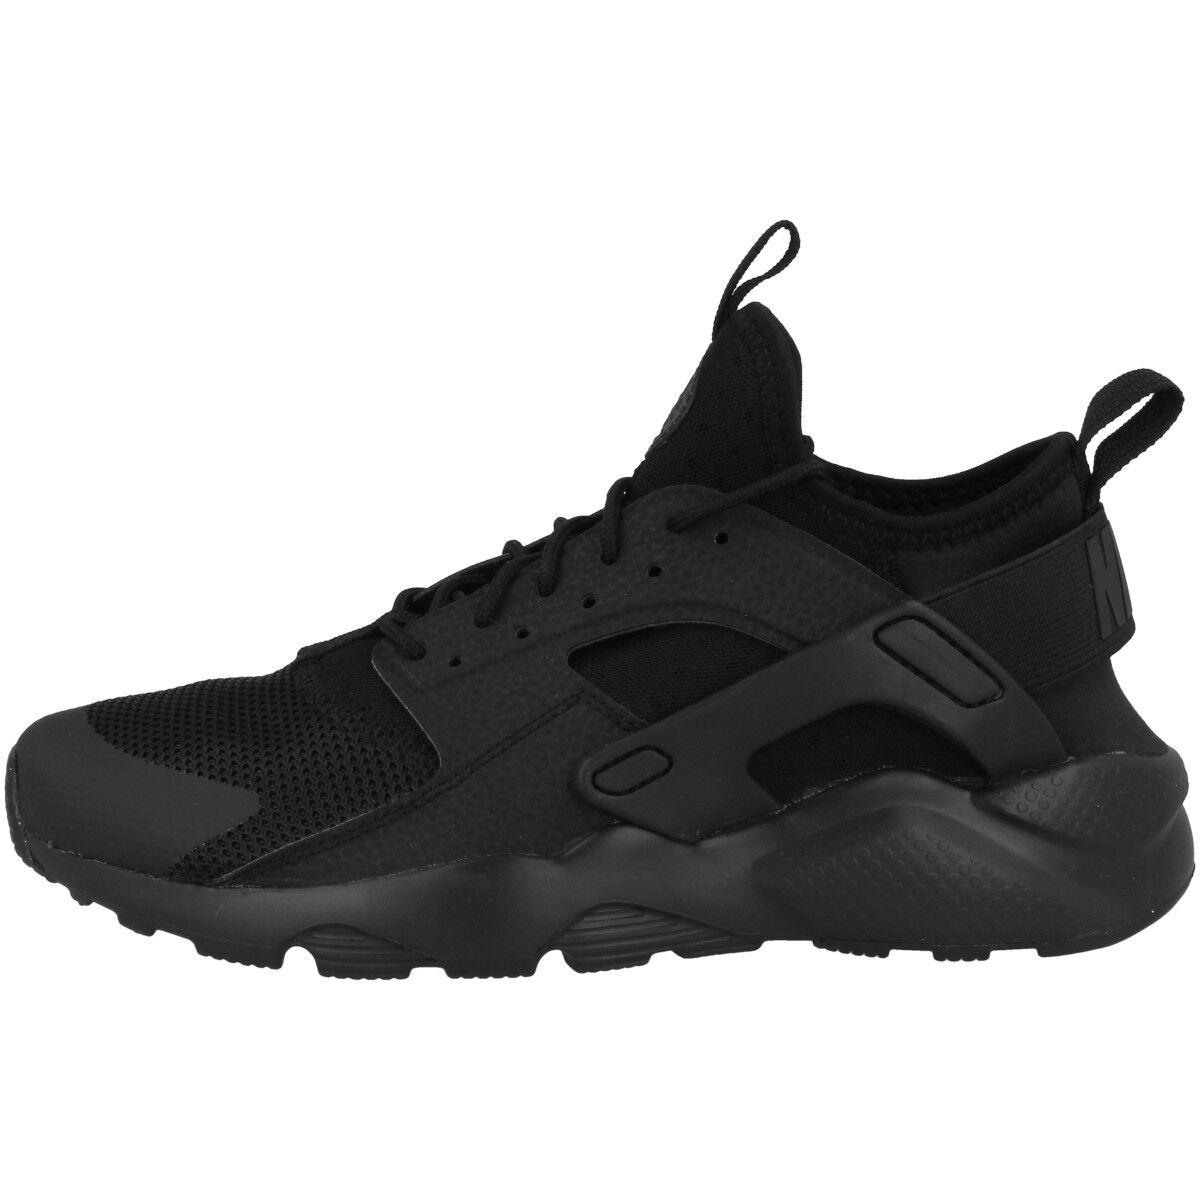 Nike Air Huarache Run Ultra Gs Scarpe Tempo Libero Sport scarpe da ginnastica Nere 847569-004